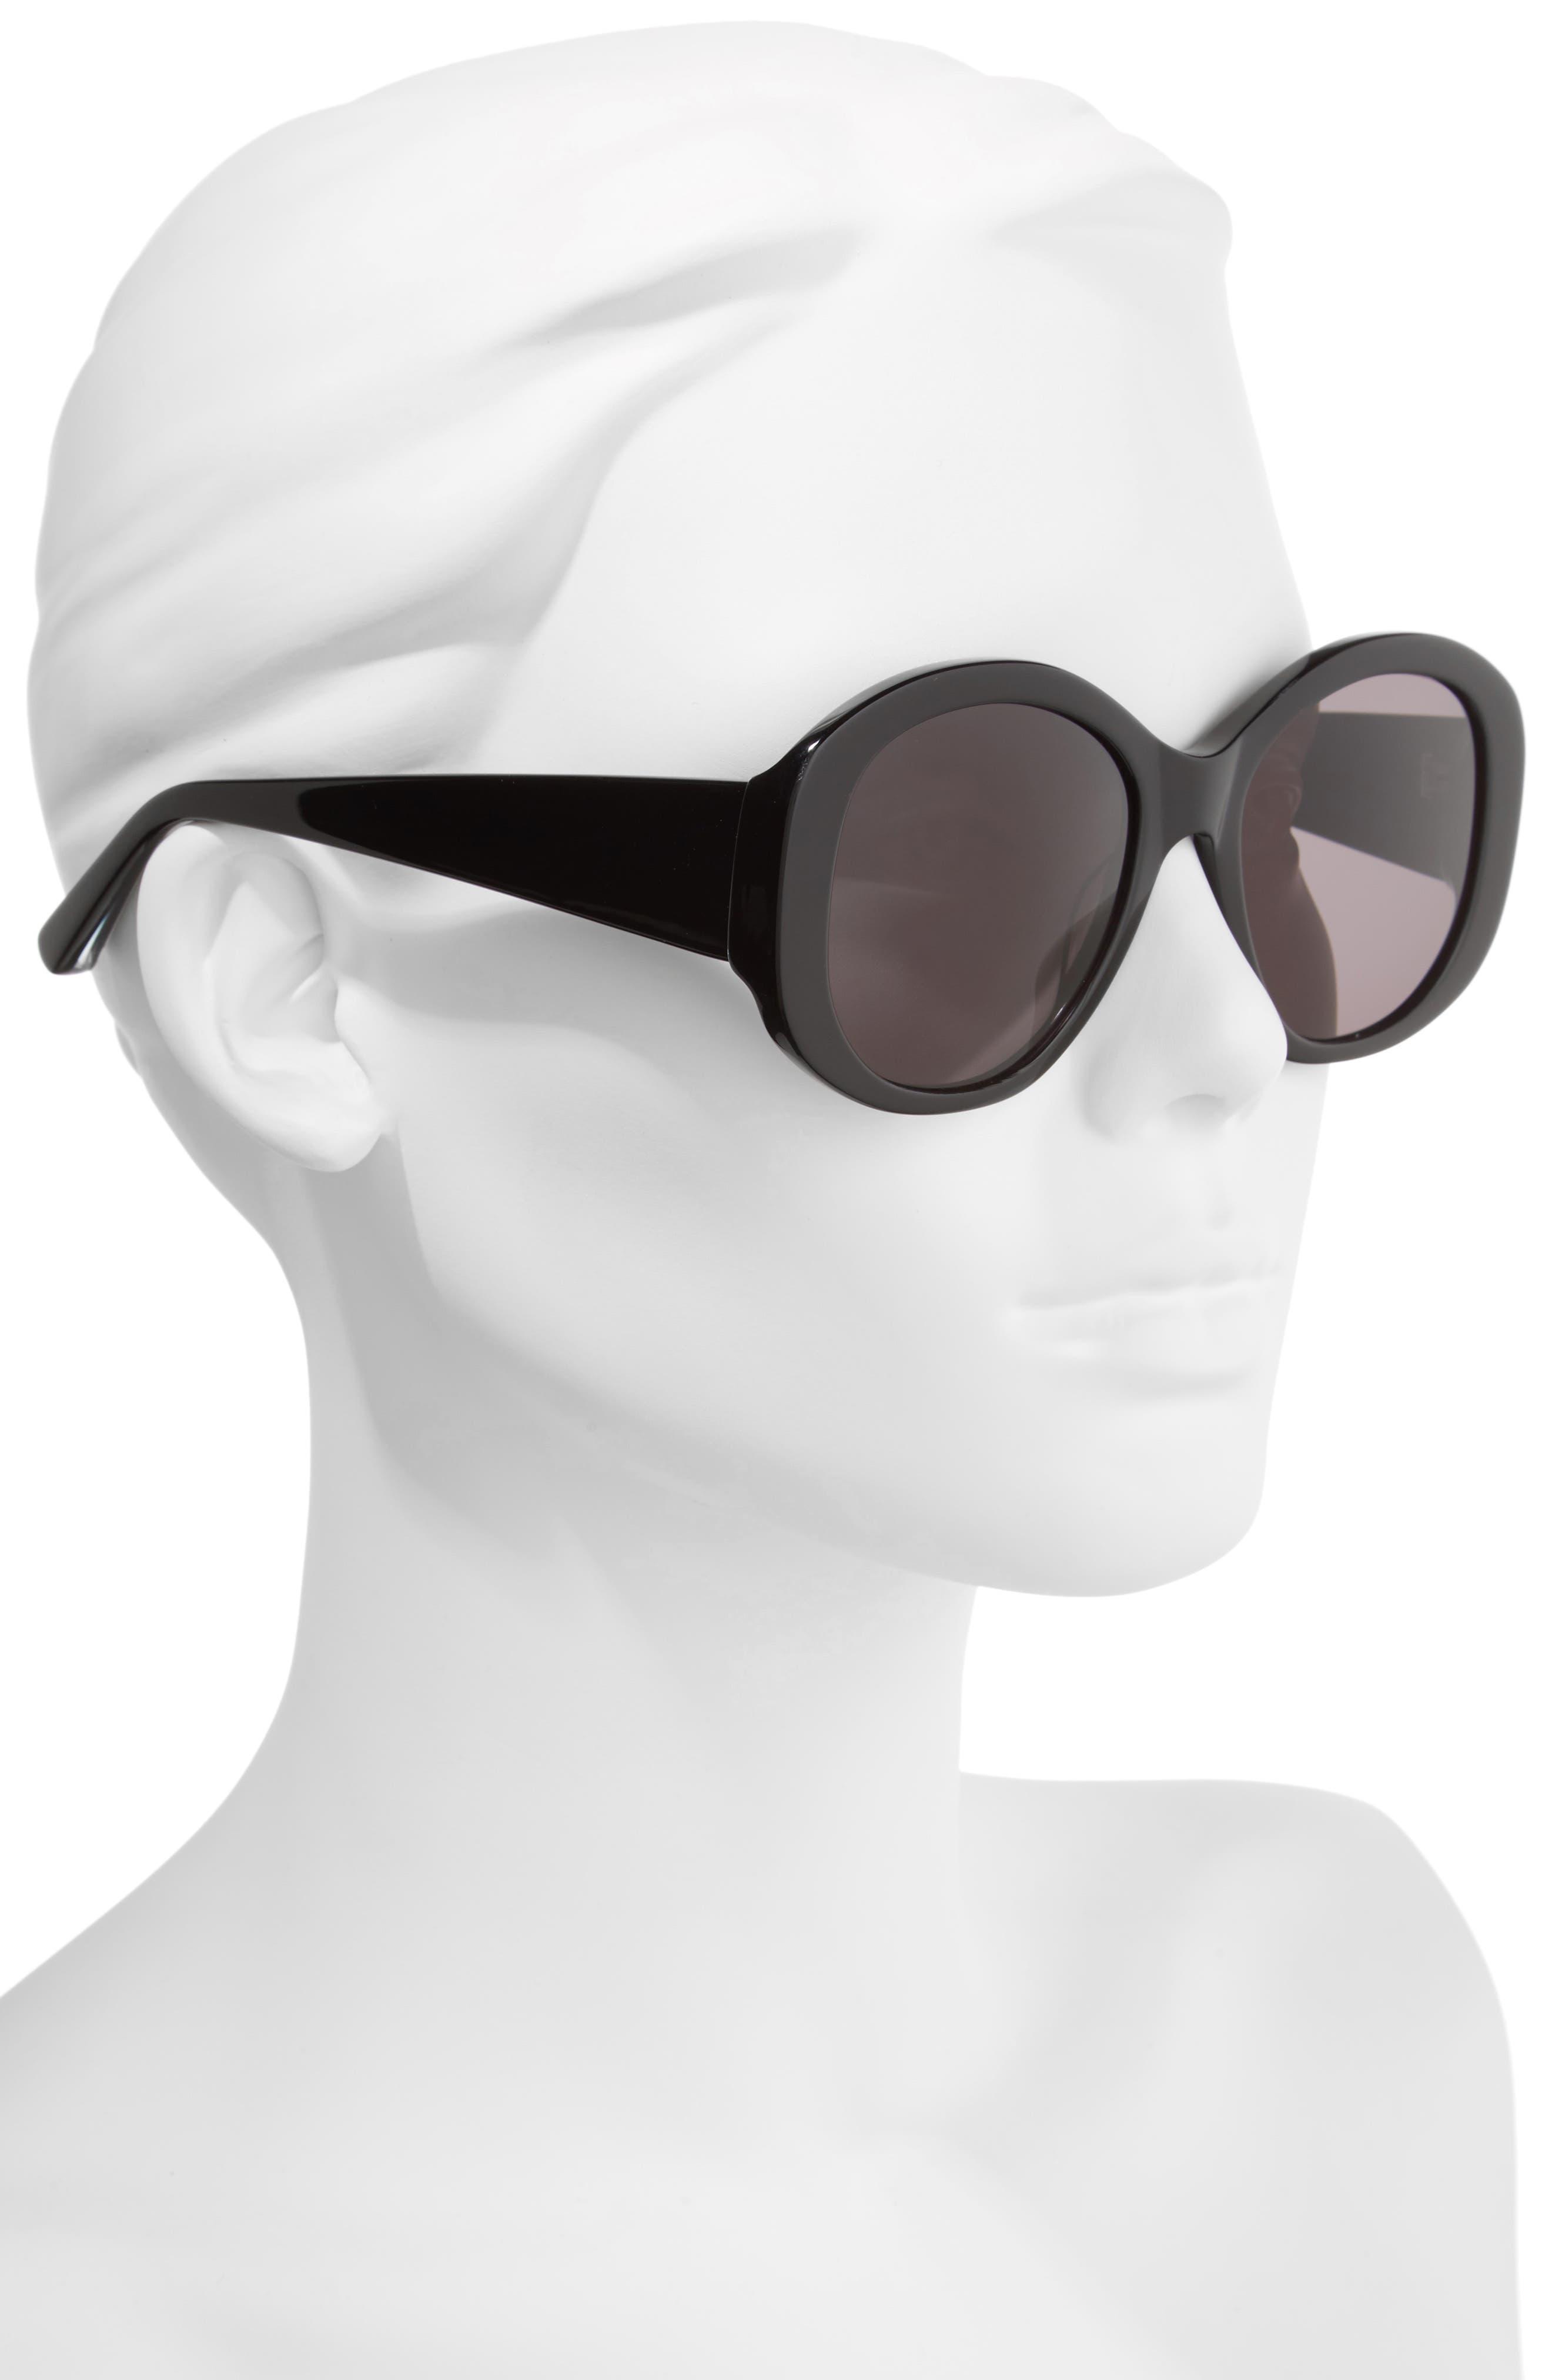 Kay 54mm Round Sunglasses,                             Alternate thumbnail 2, color,                             001